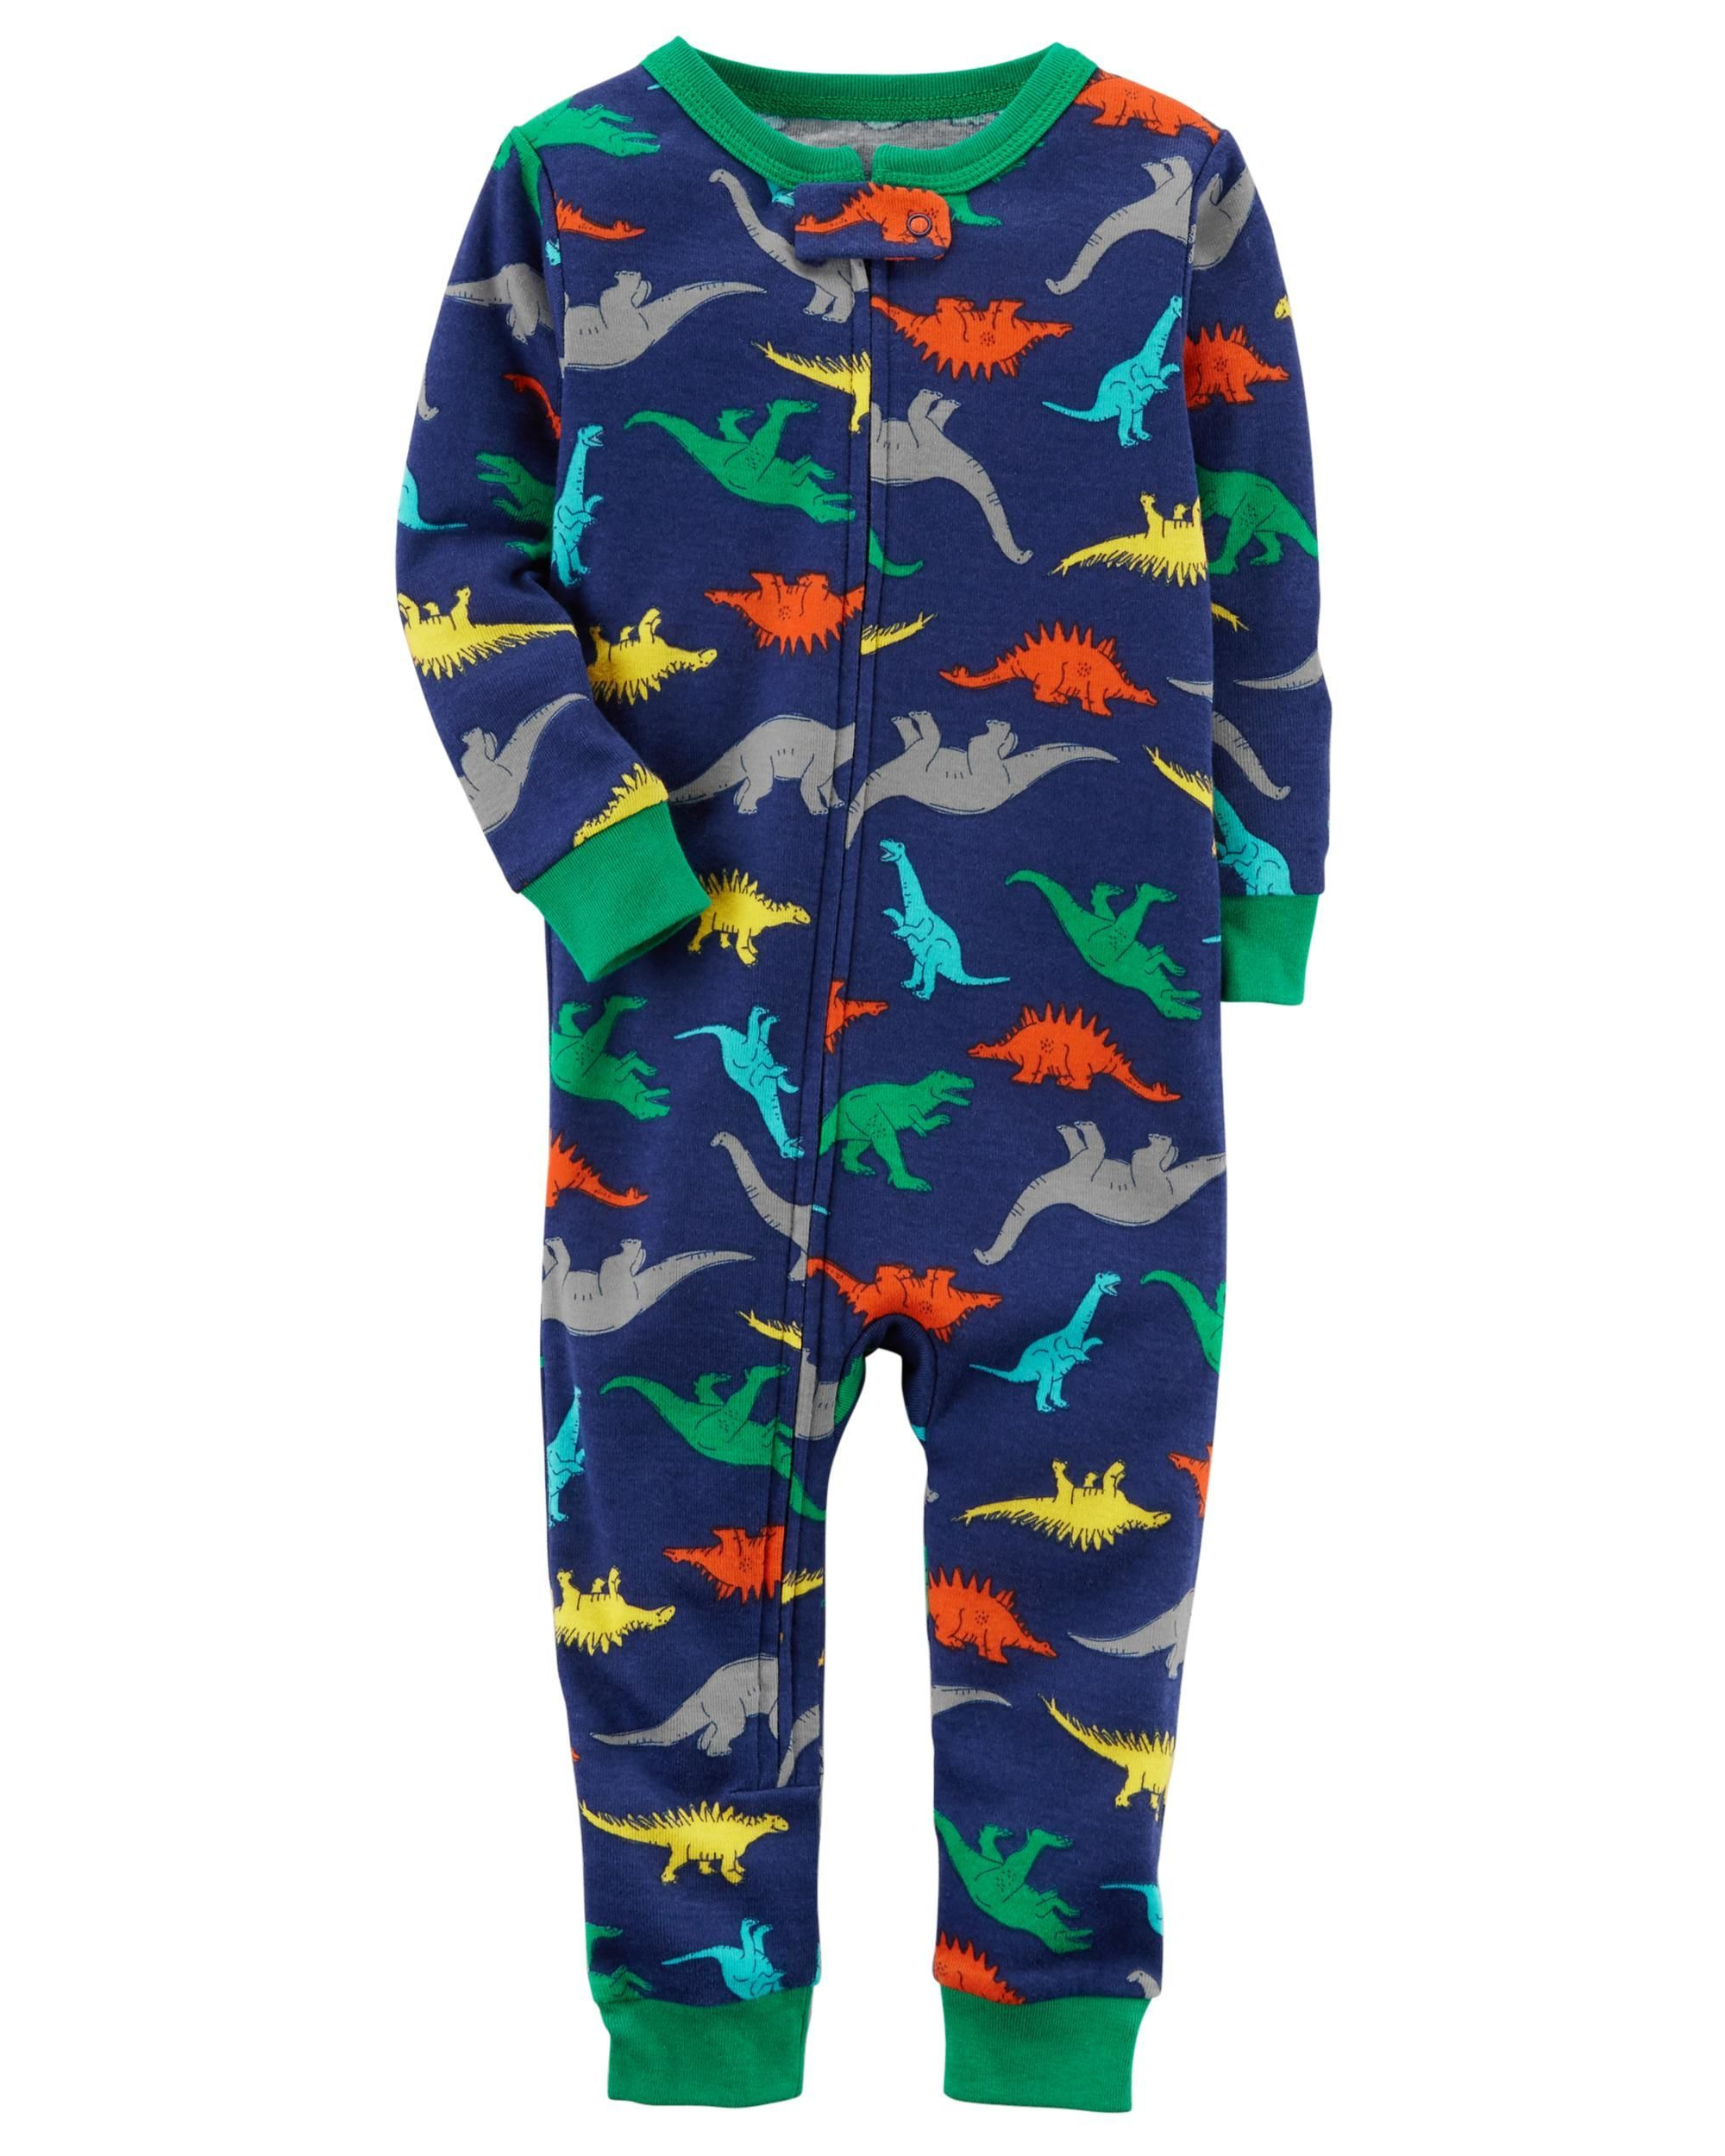 88b106c088ad Baby Boy 1-Piece Snug Fit Cotton Footless PJs